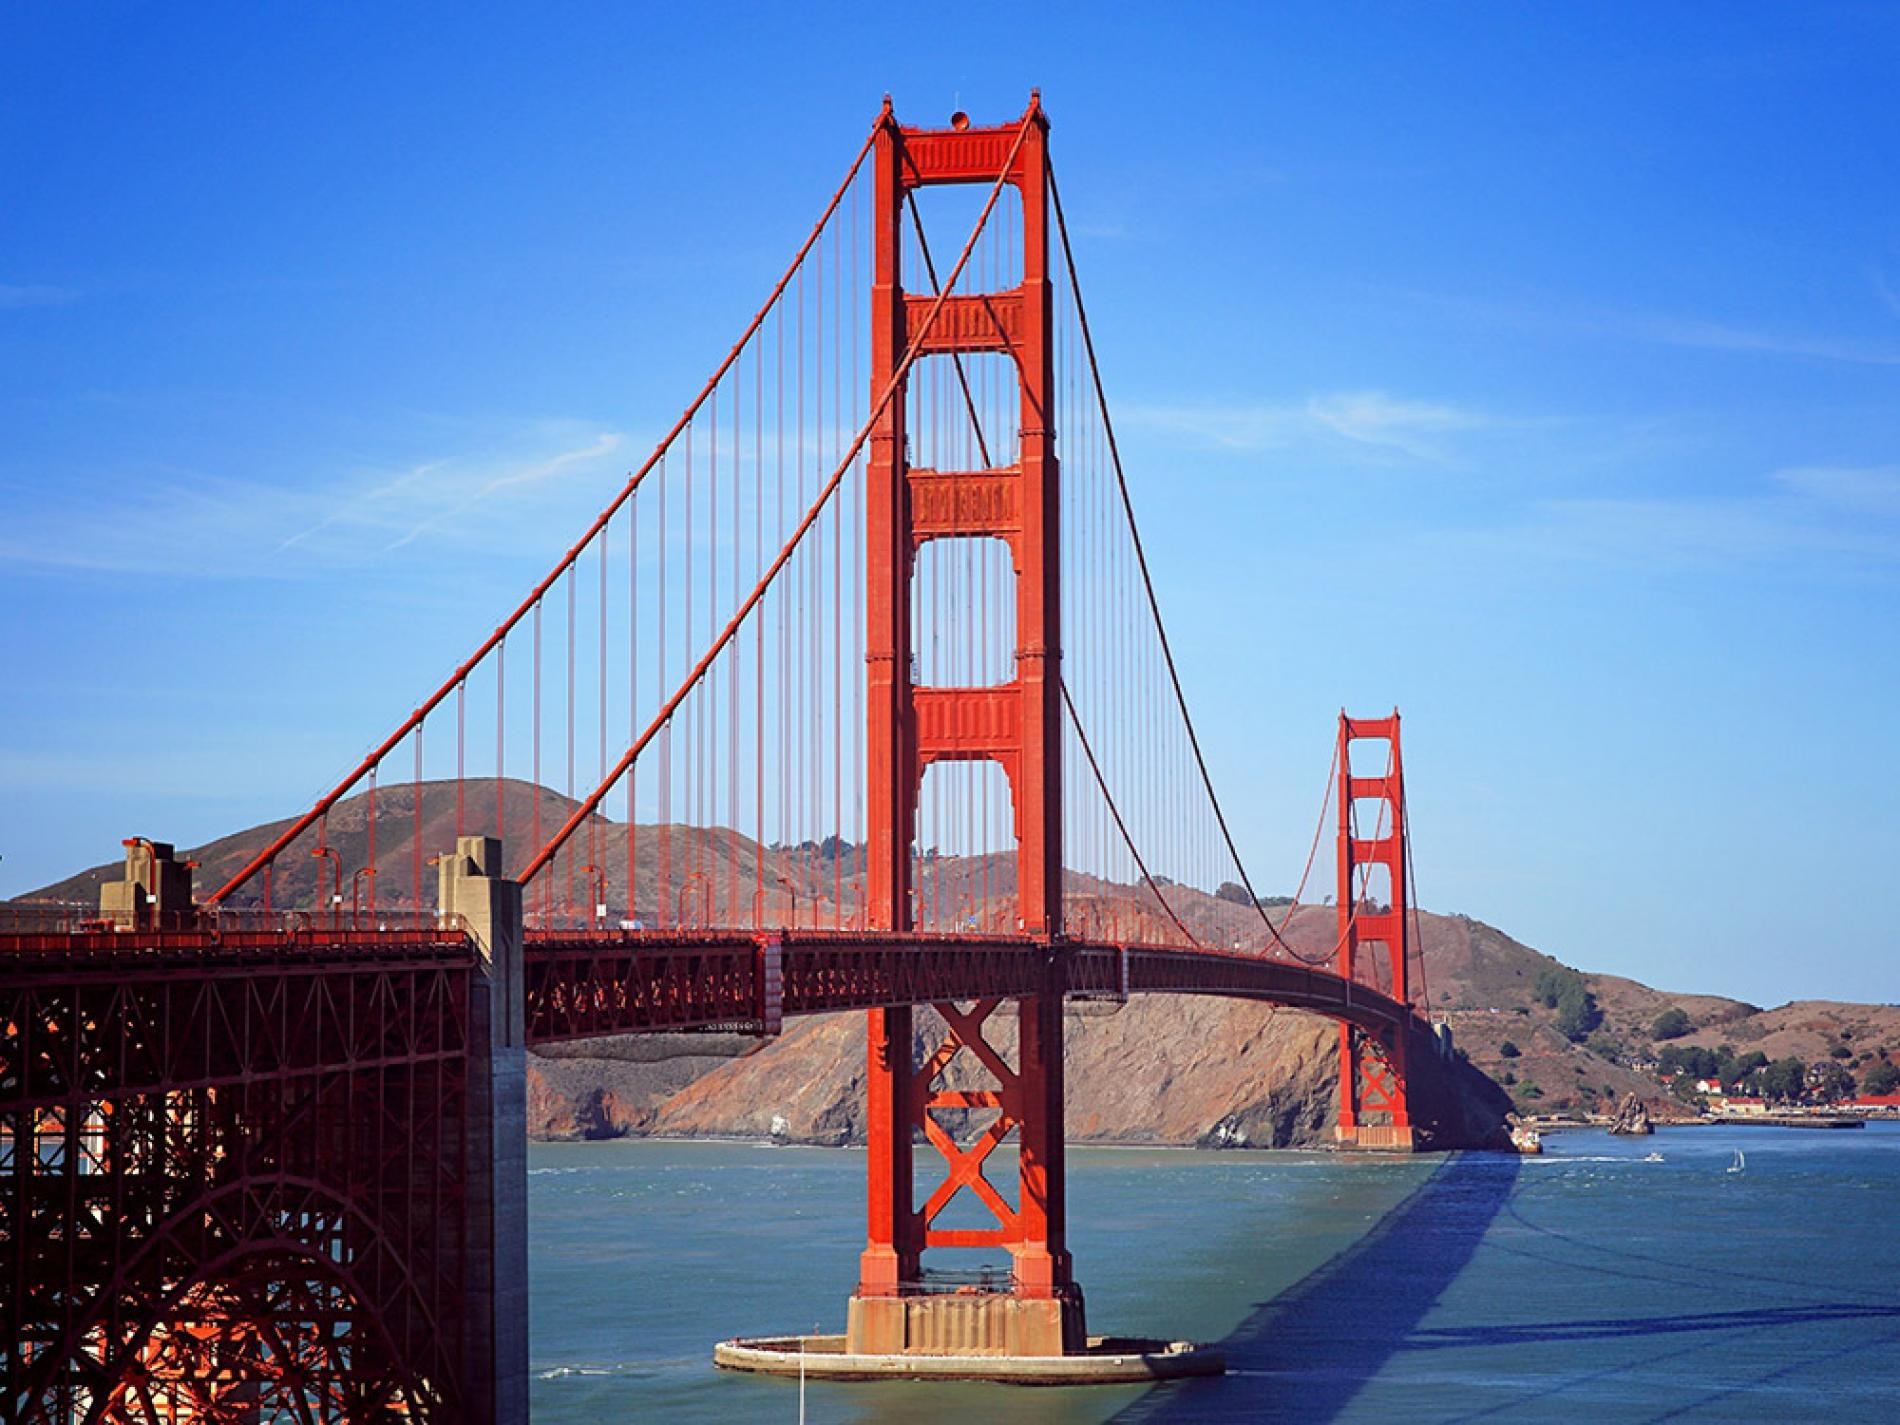 San Francisco Day Tour: Golden Gate Bridge & Fisherman's Wharf - KKday